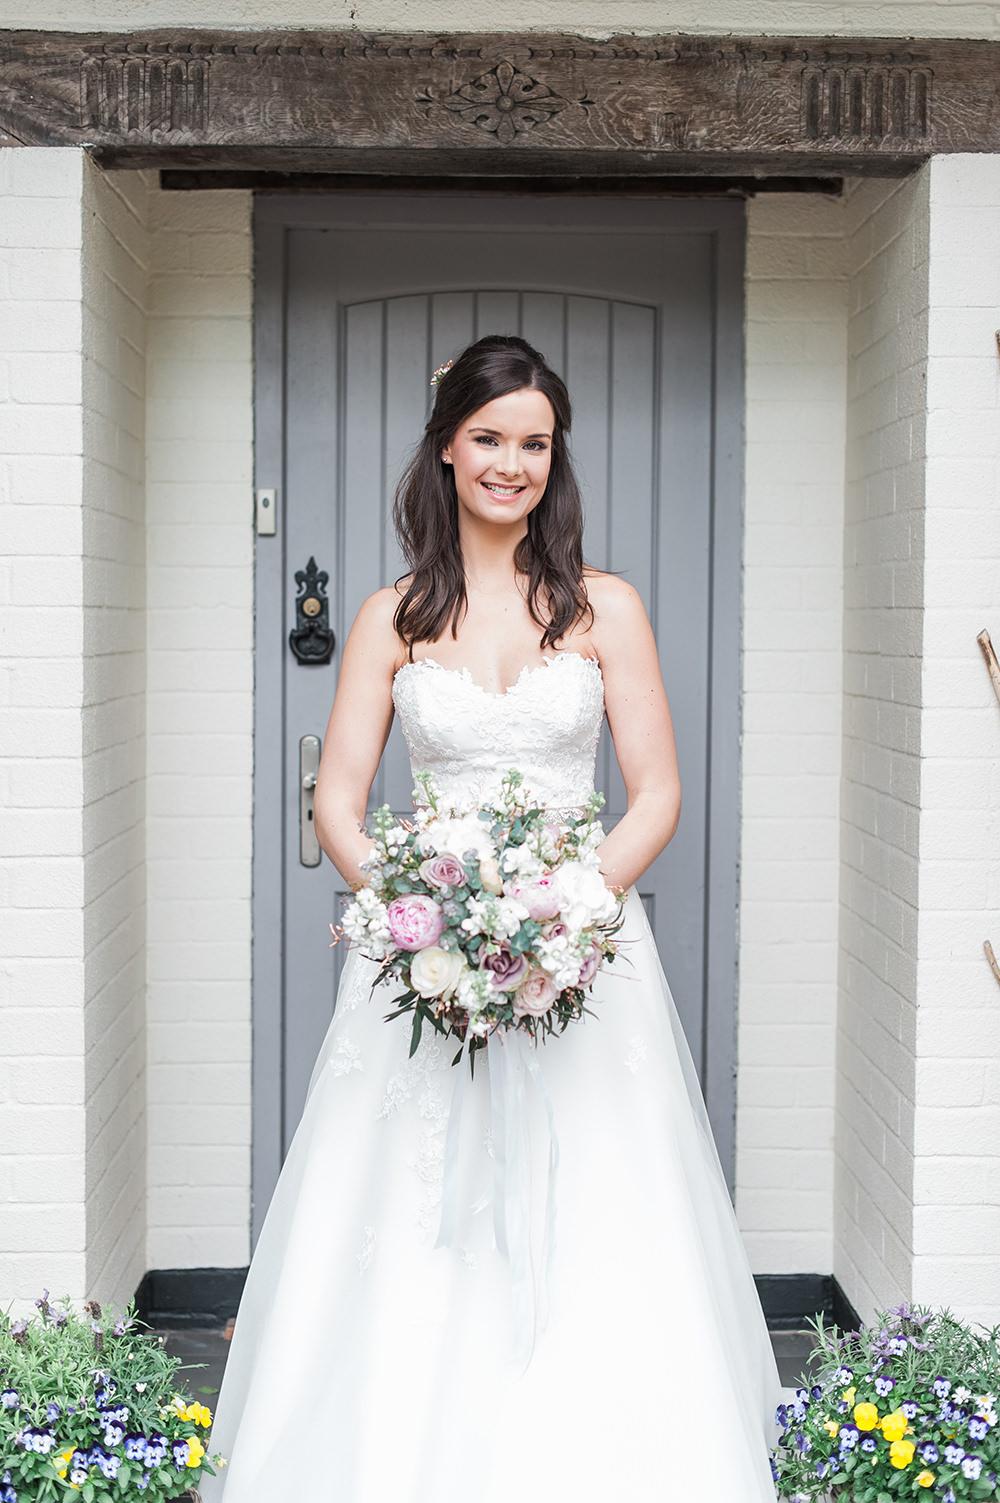 Bride Bridal Gown Dress Strapless Sweetheart Neckline Ribbon Belt Pink Rose Peony Bouquet Edmondsham House Wedding Darima Frampton Photography